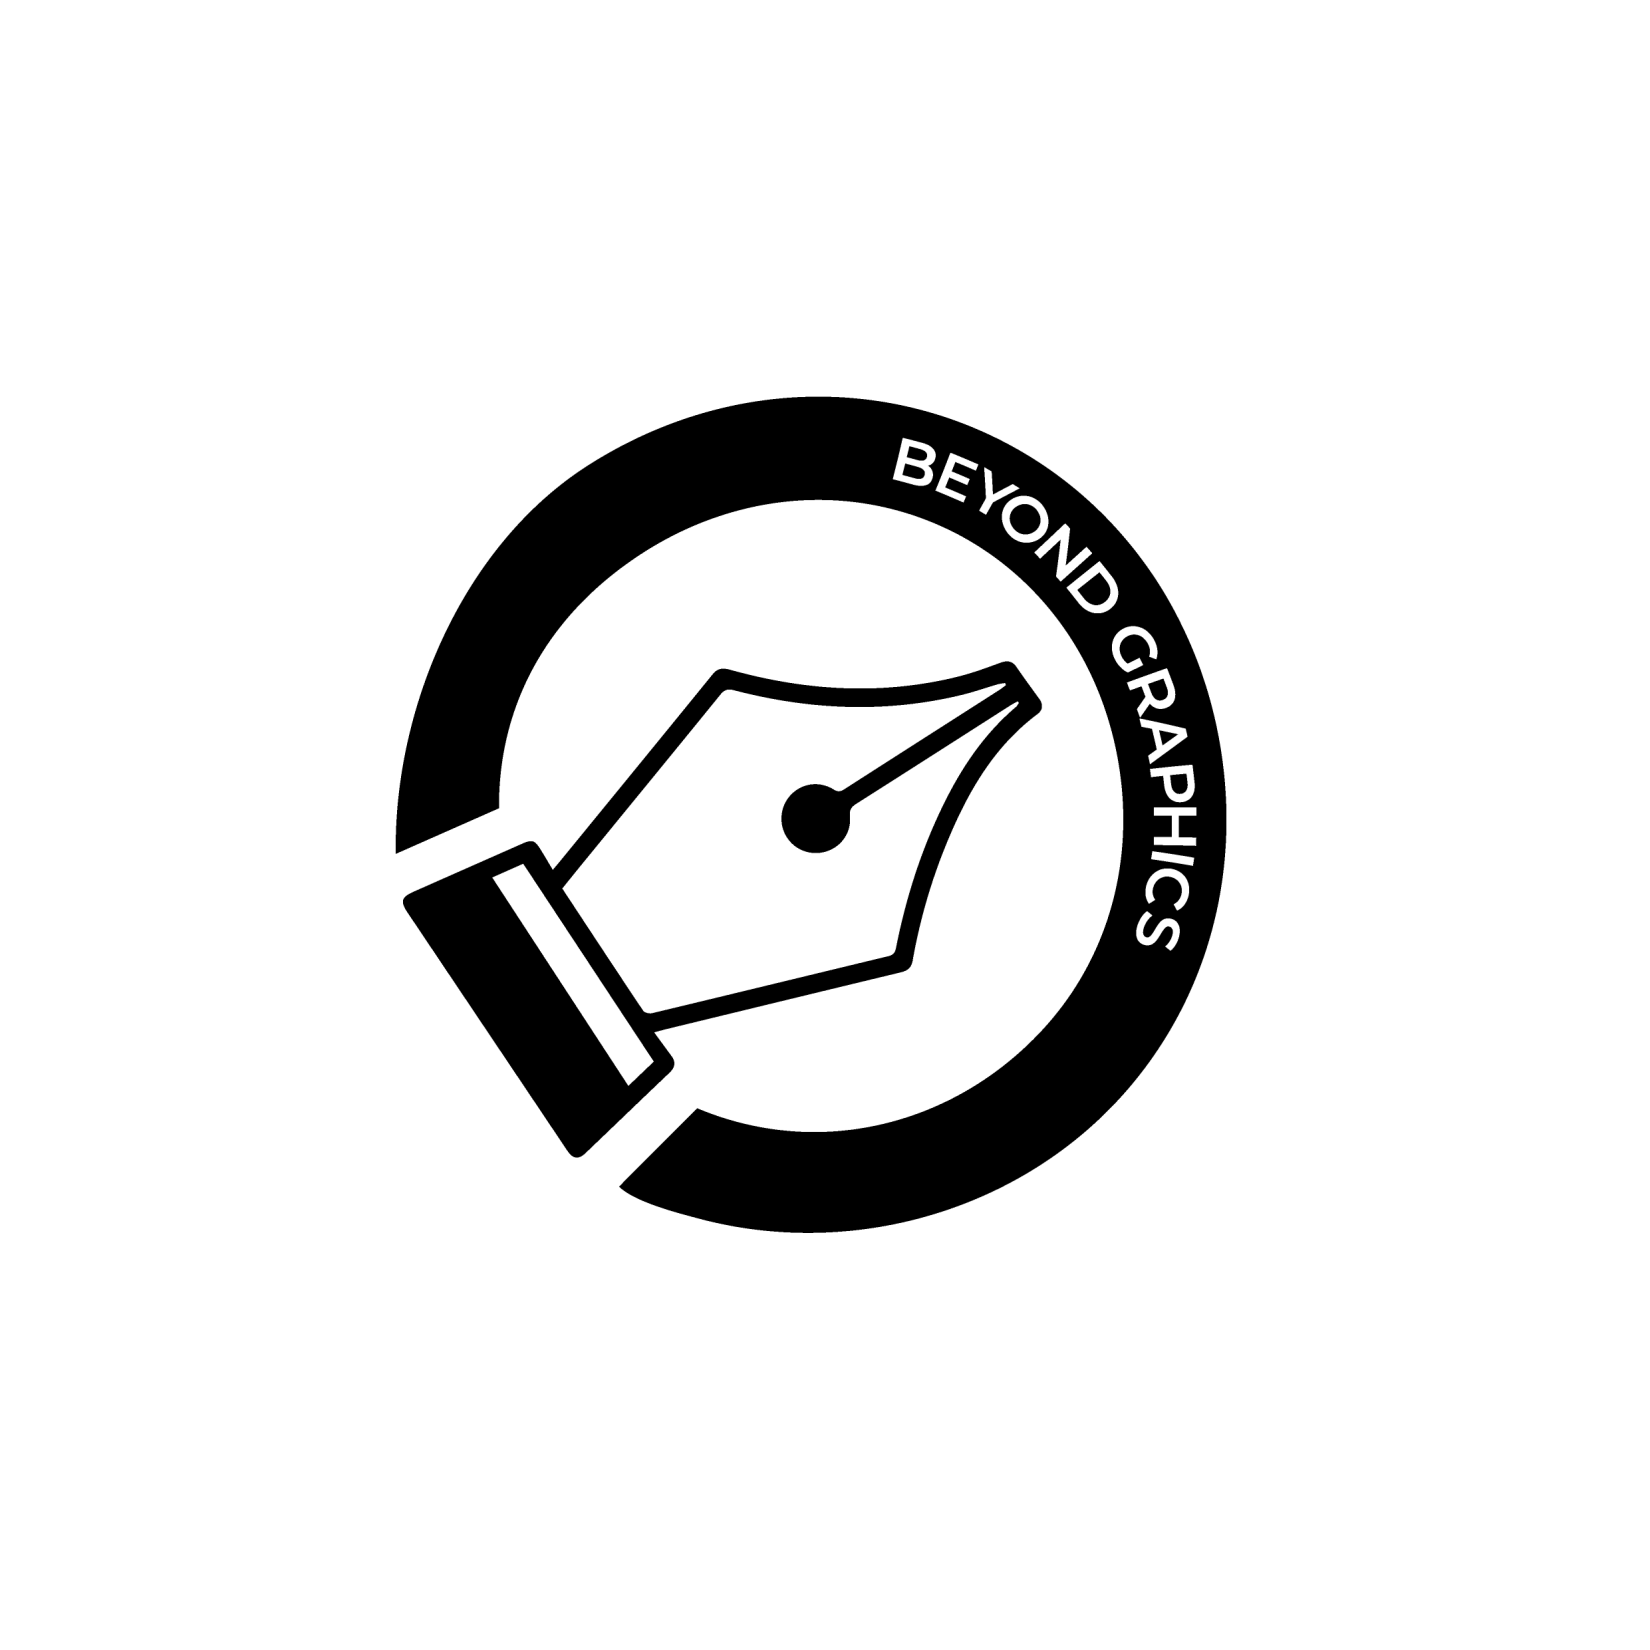 BG_logo_rondje-01